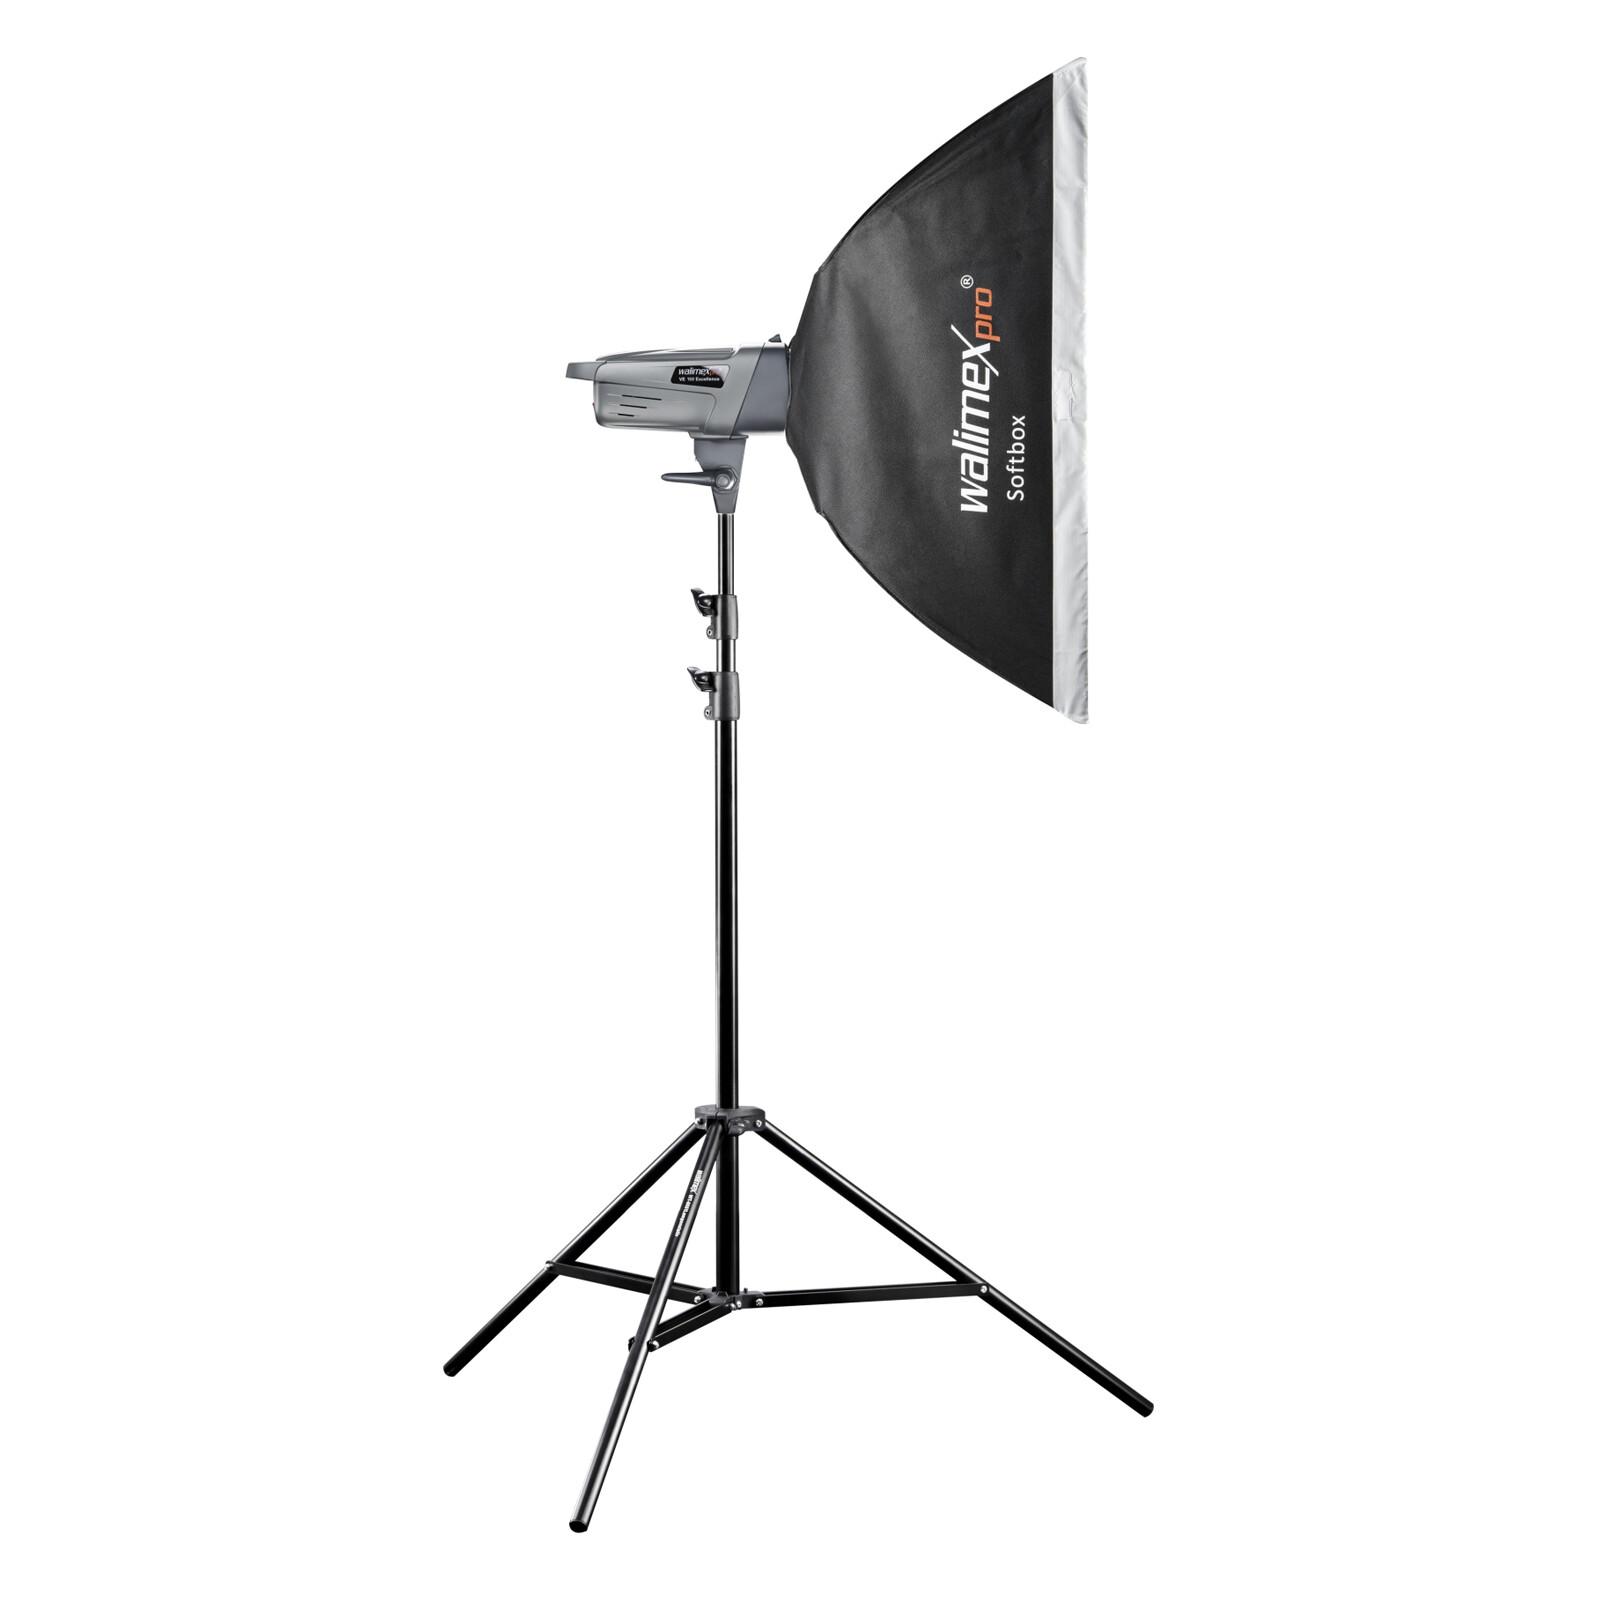 walimex pro Studioset VE-150 Excellence